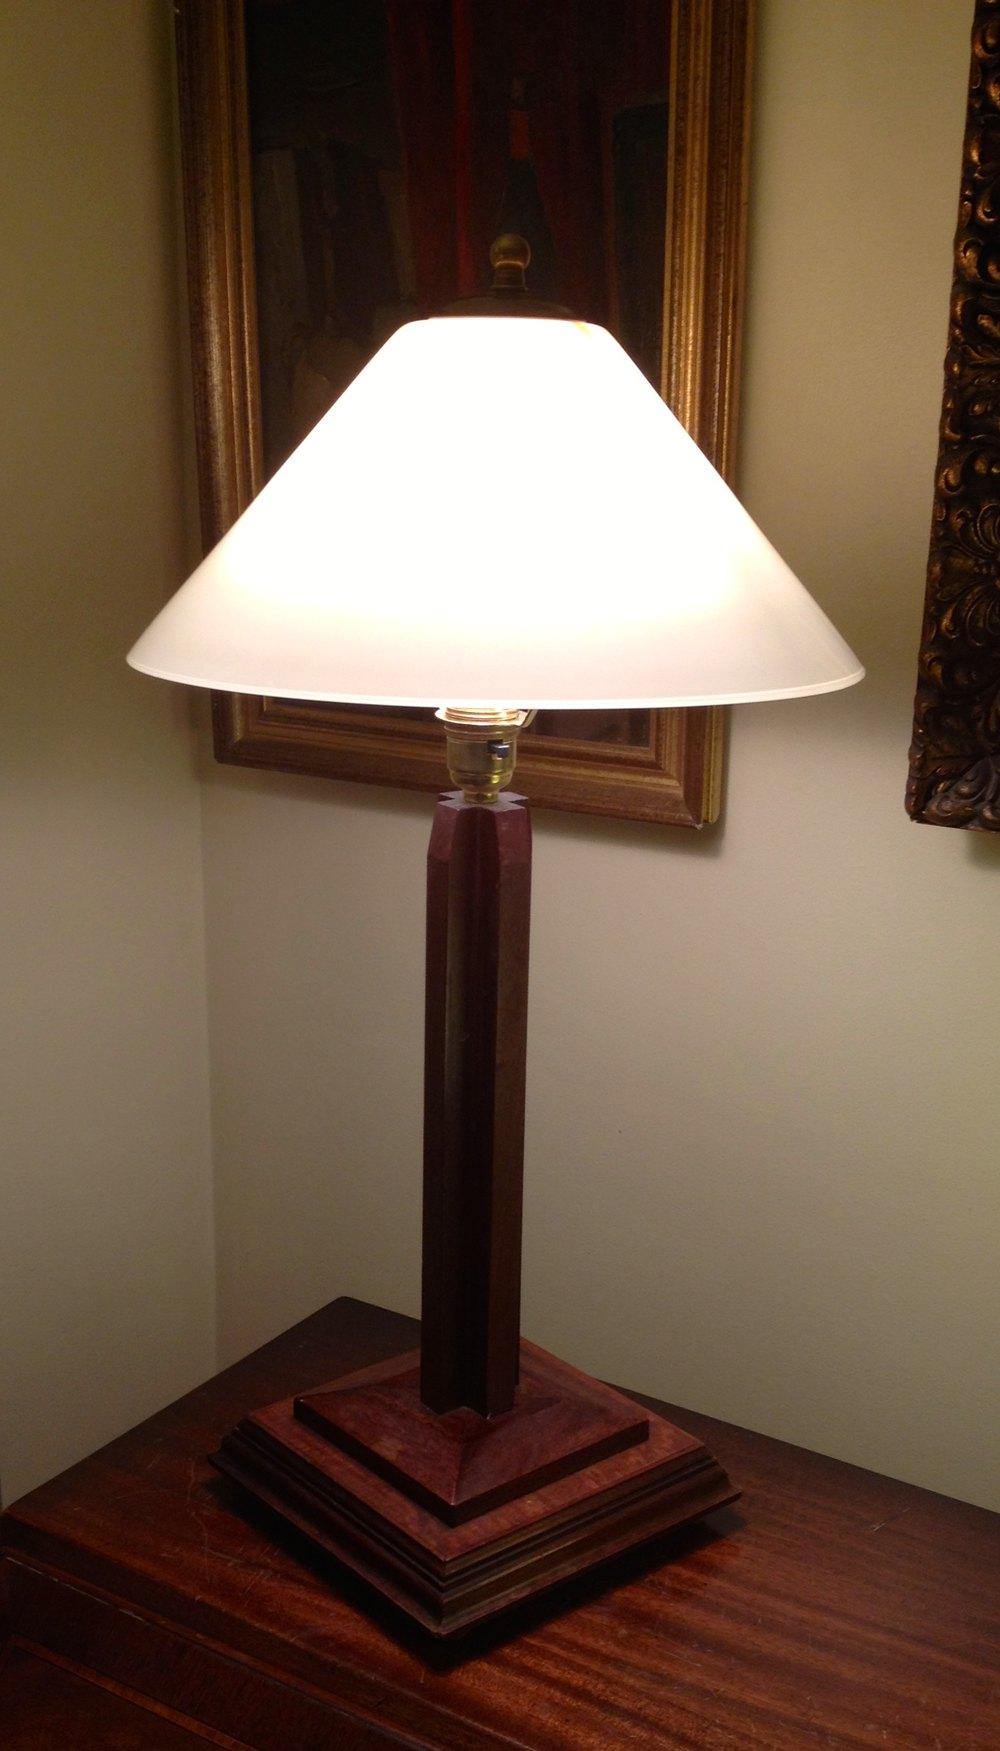 Antiques atlas classic art deco desk or console lamp mahogany table lamps alt5 geotapseo Choice Image